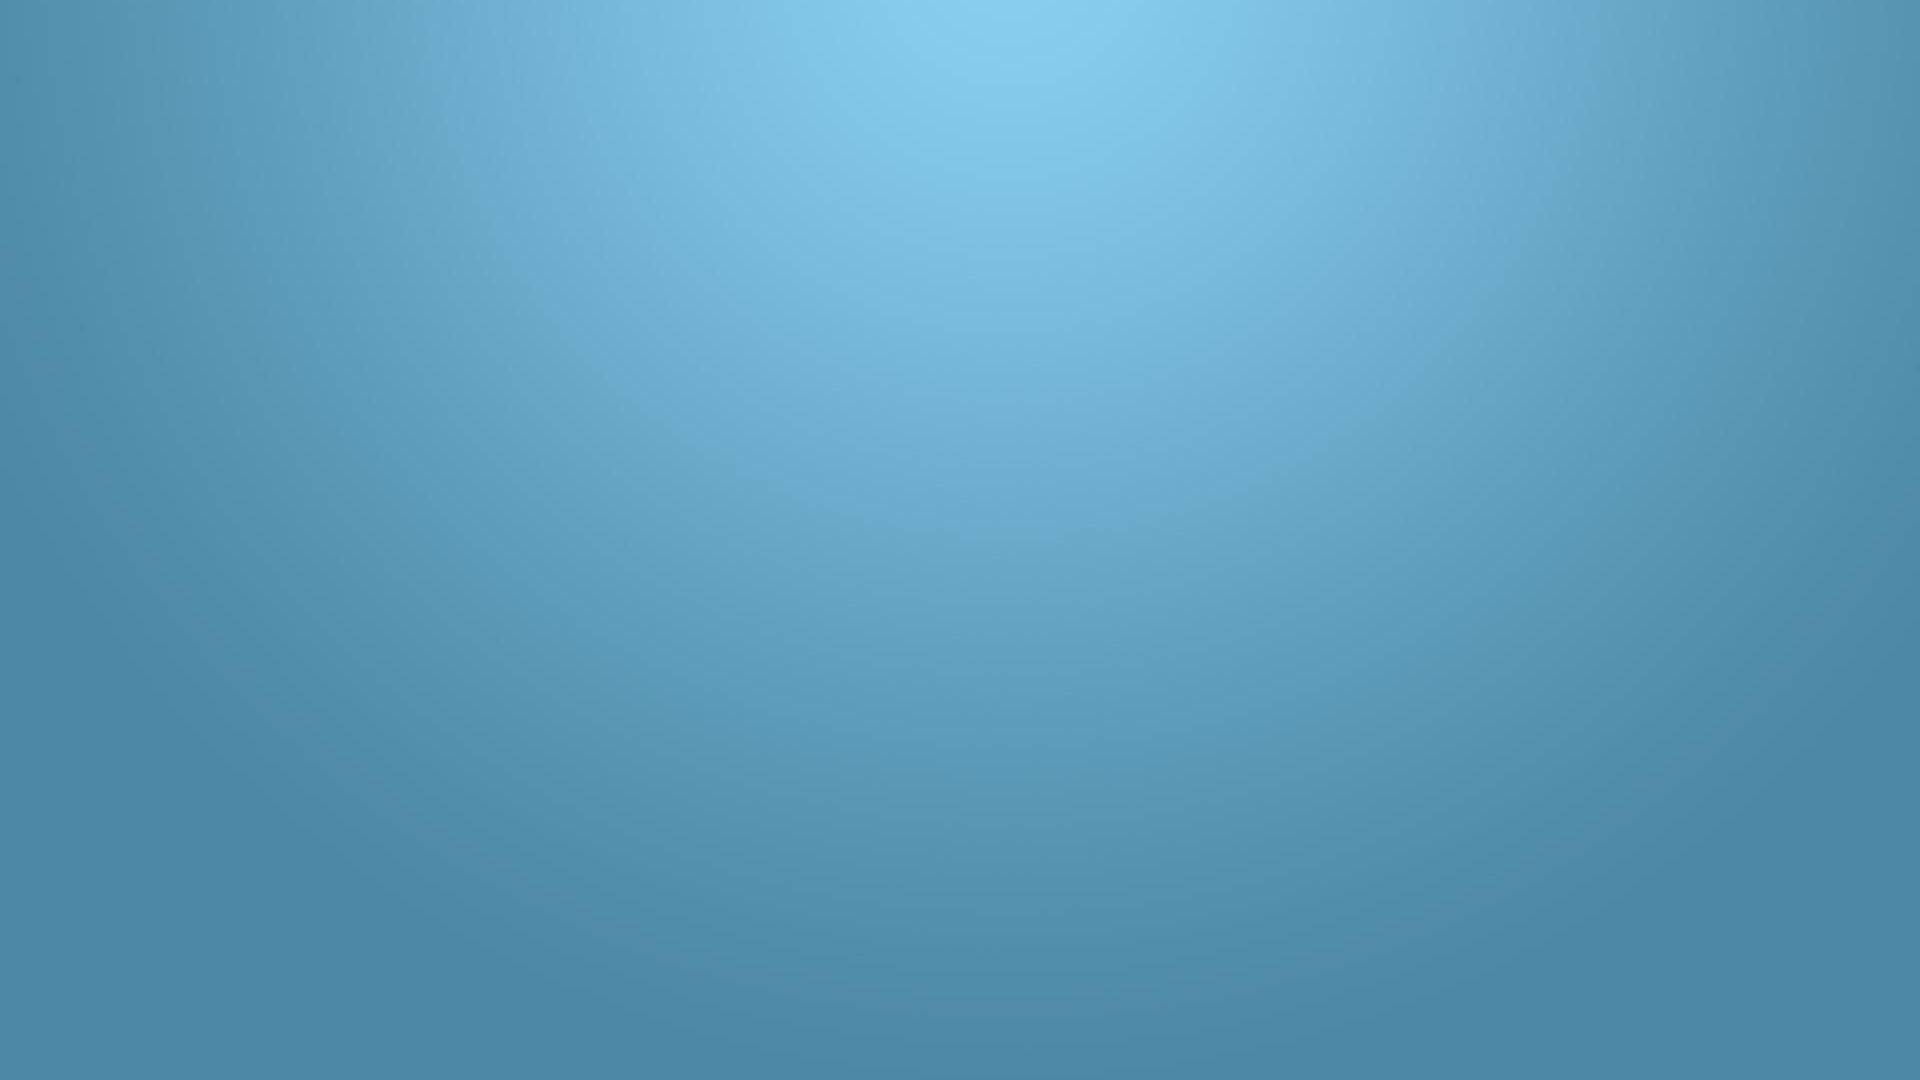   Baby Blue Windows 7 Wallpaper